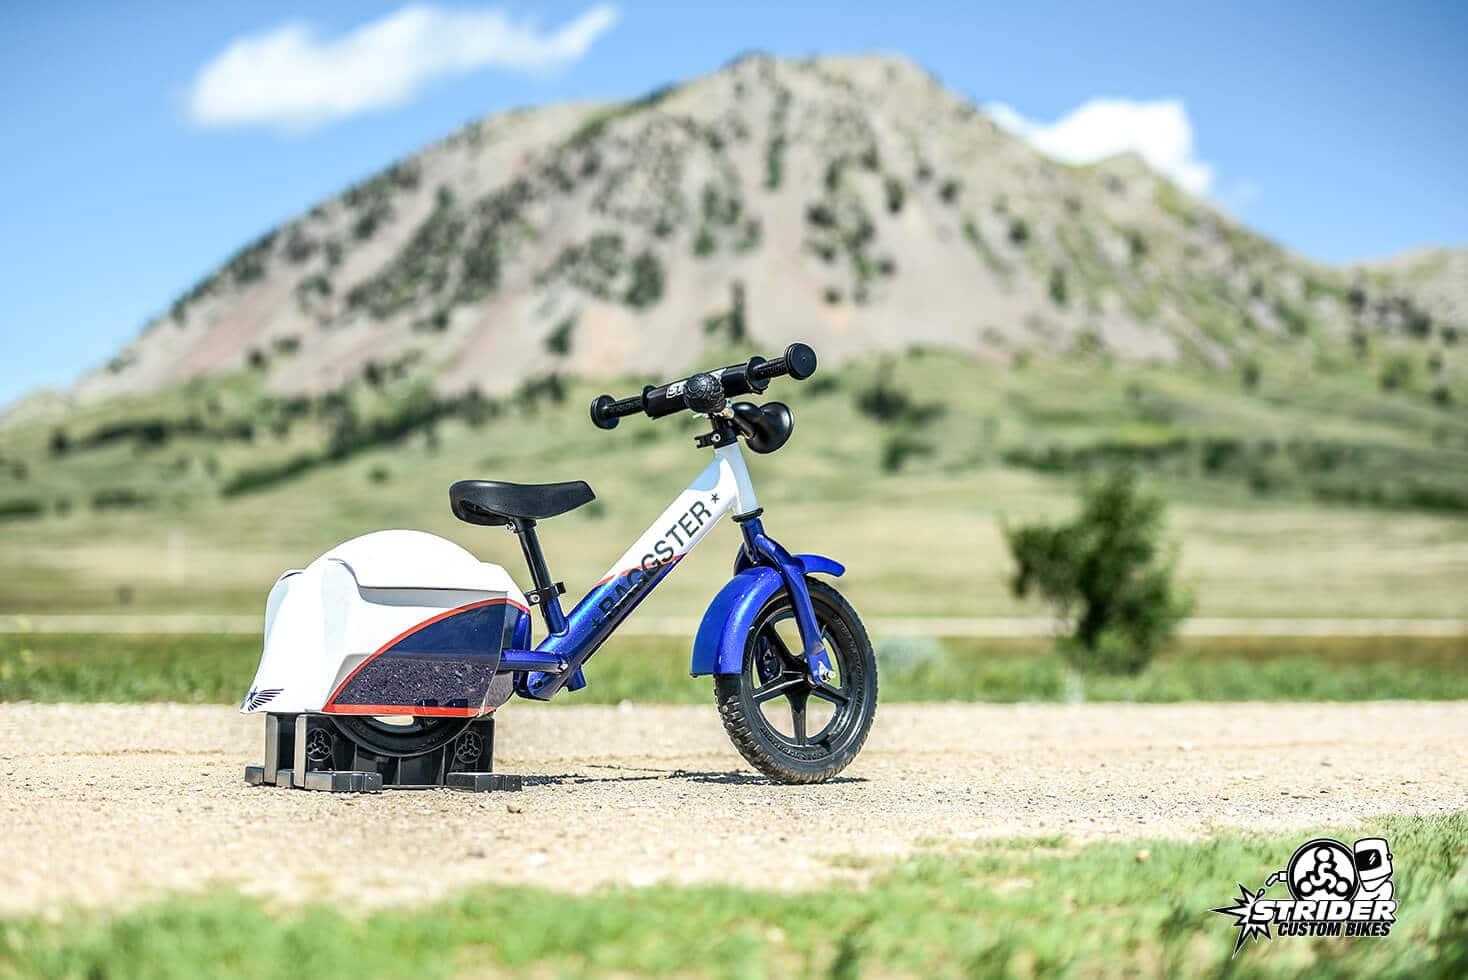 strider custom bikes